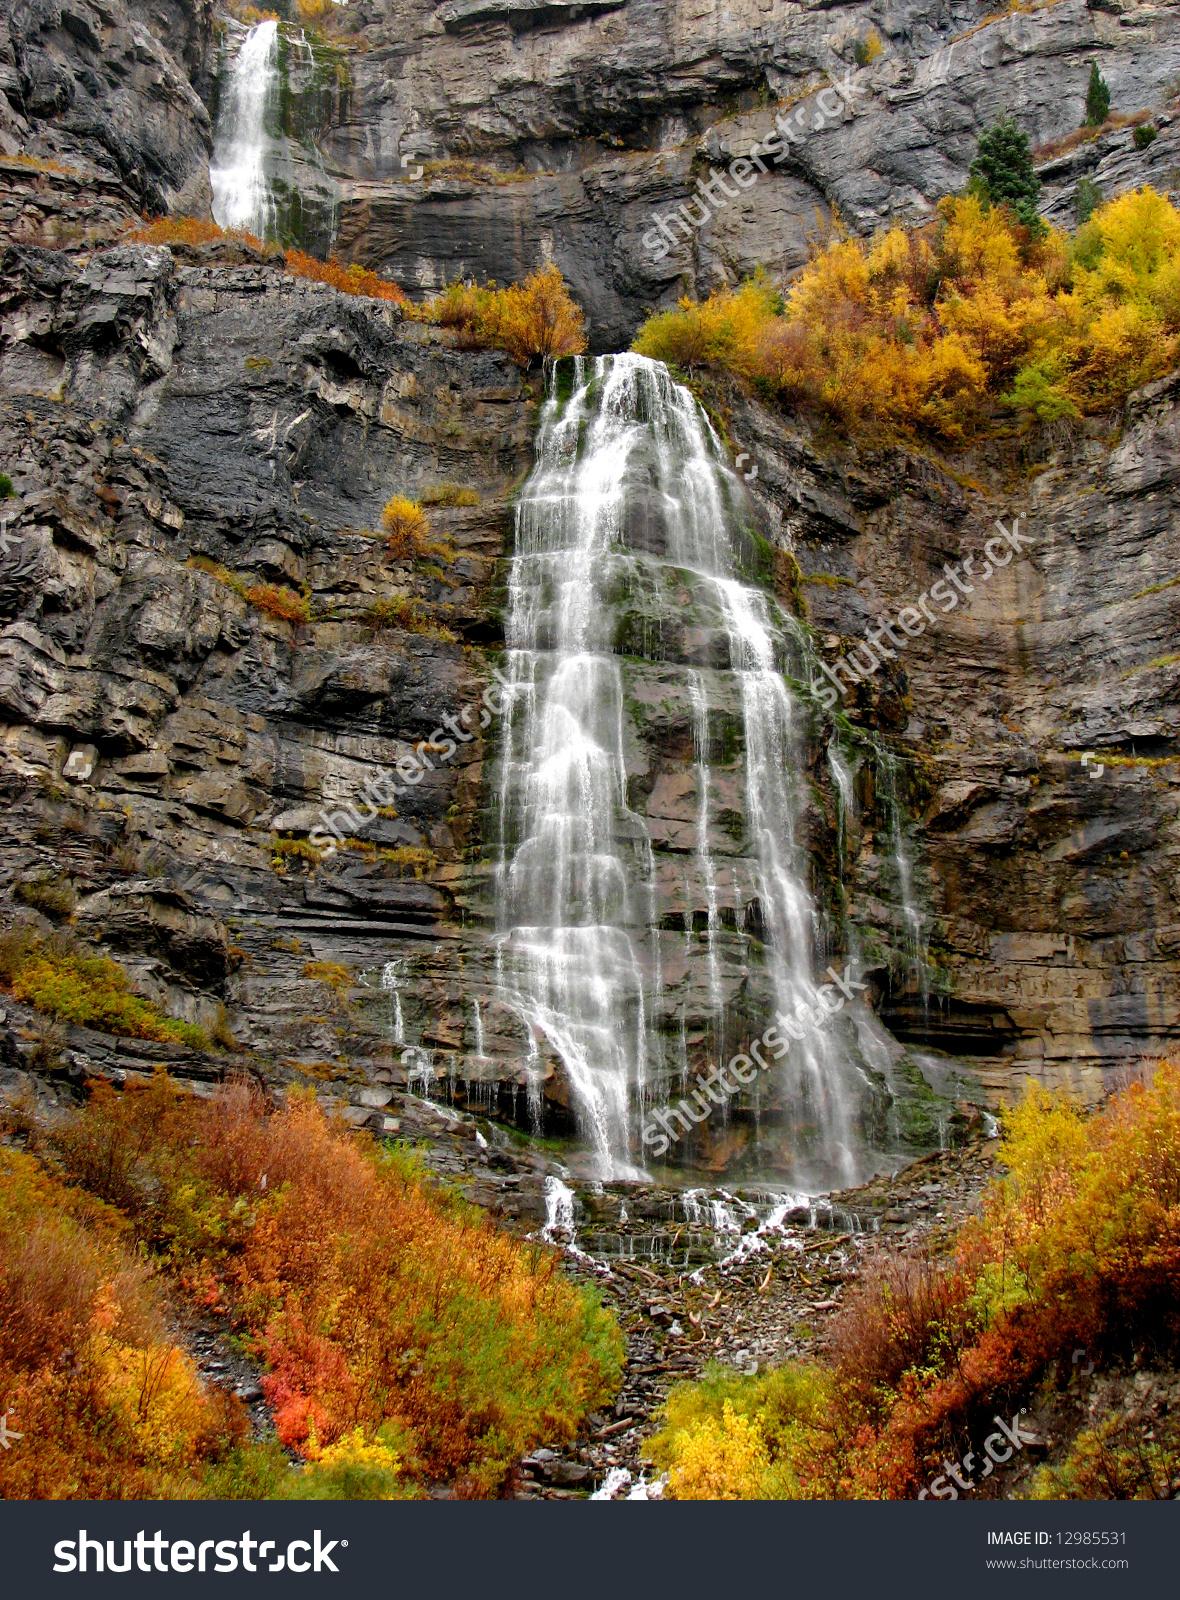 Bridal Veil Falls In Provo, Utah Stock Photo 12985531 : Shutterstock.